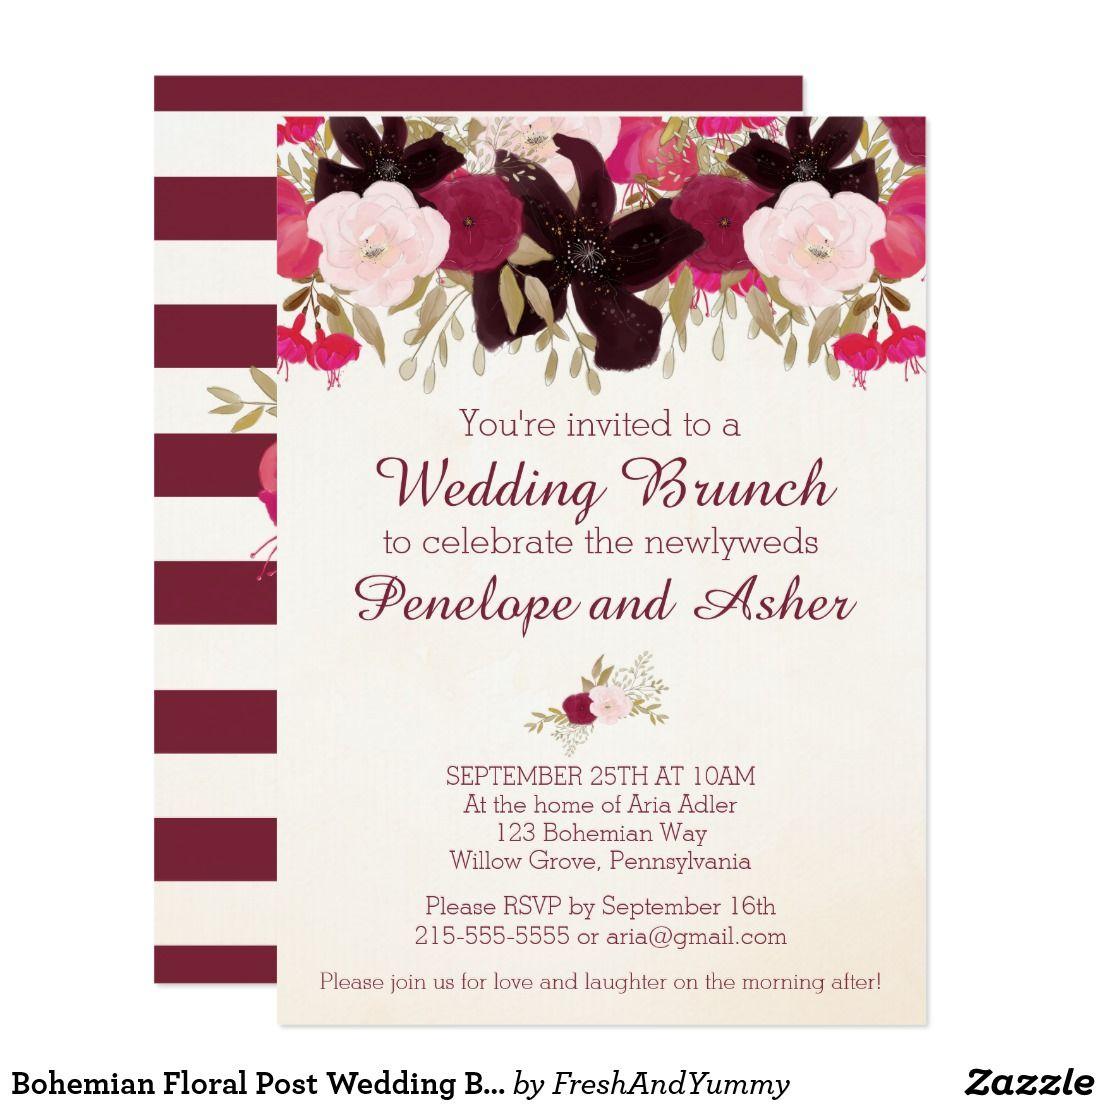 Bohemian Floral Post Wedding Brunch Invitation | Brunch invitations ...